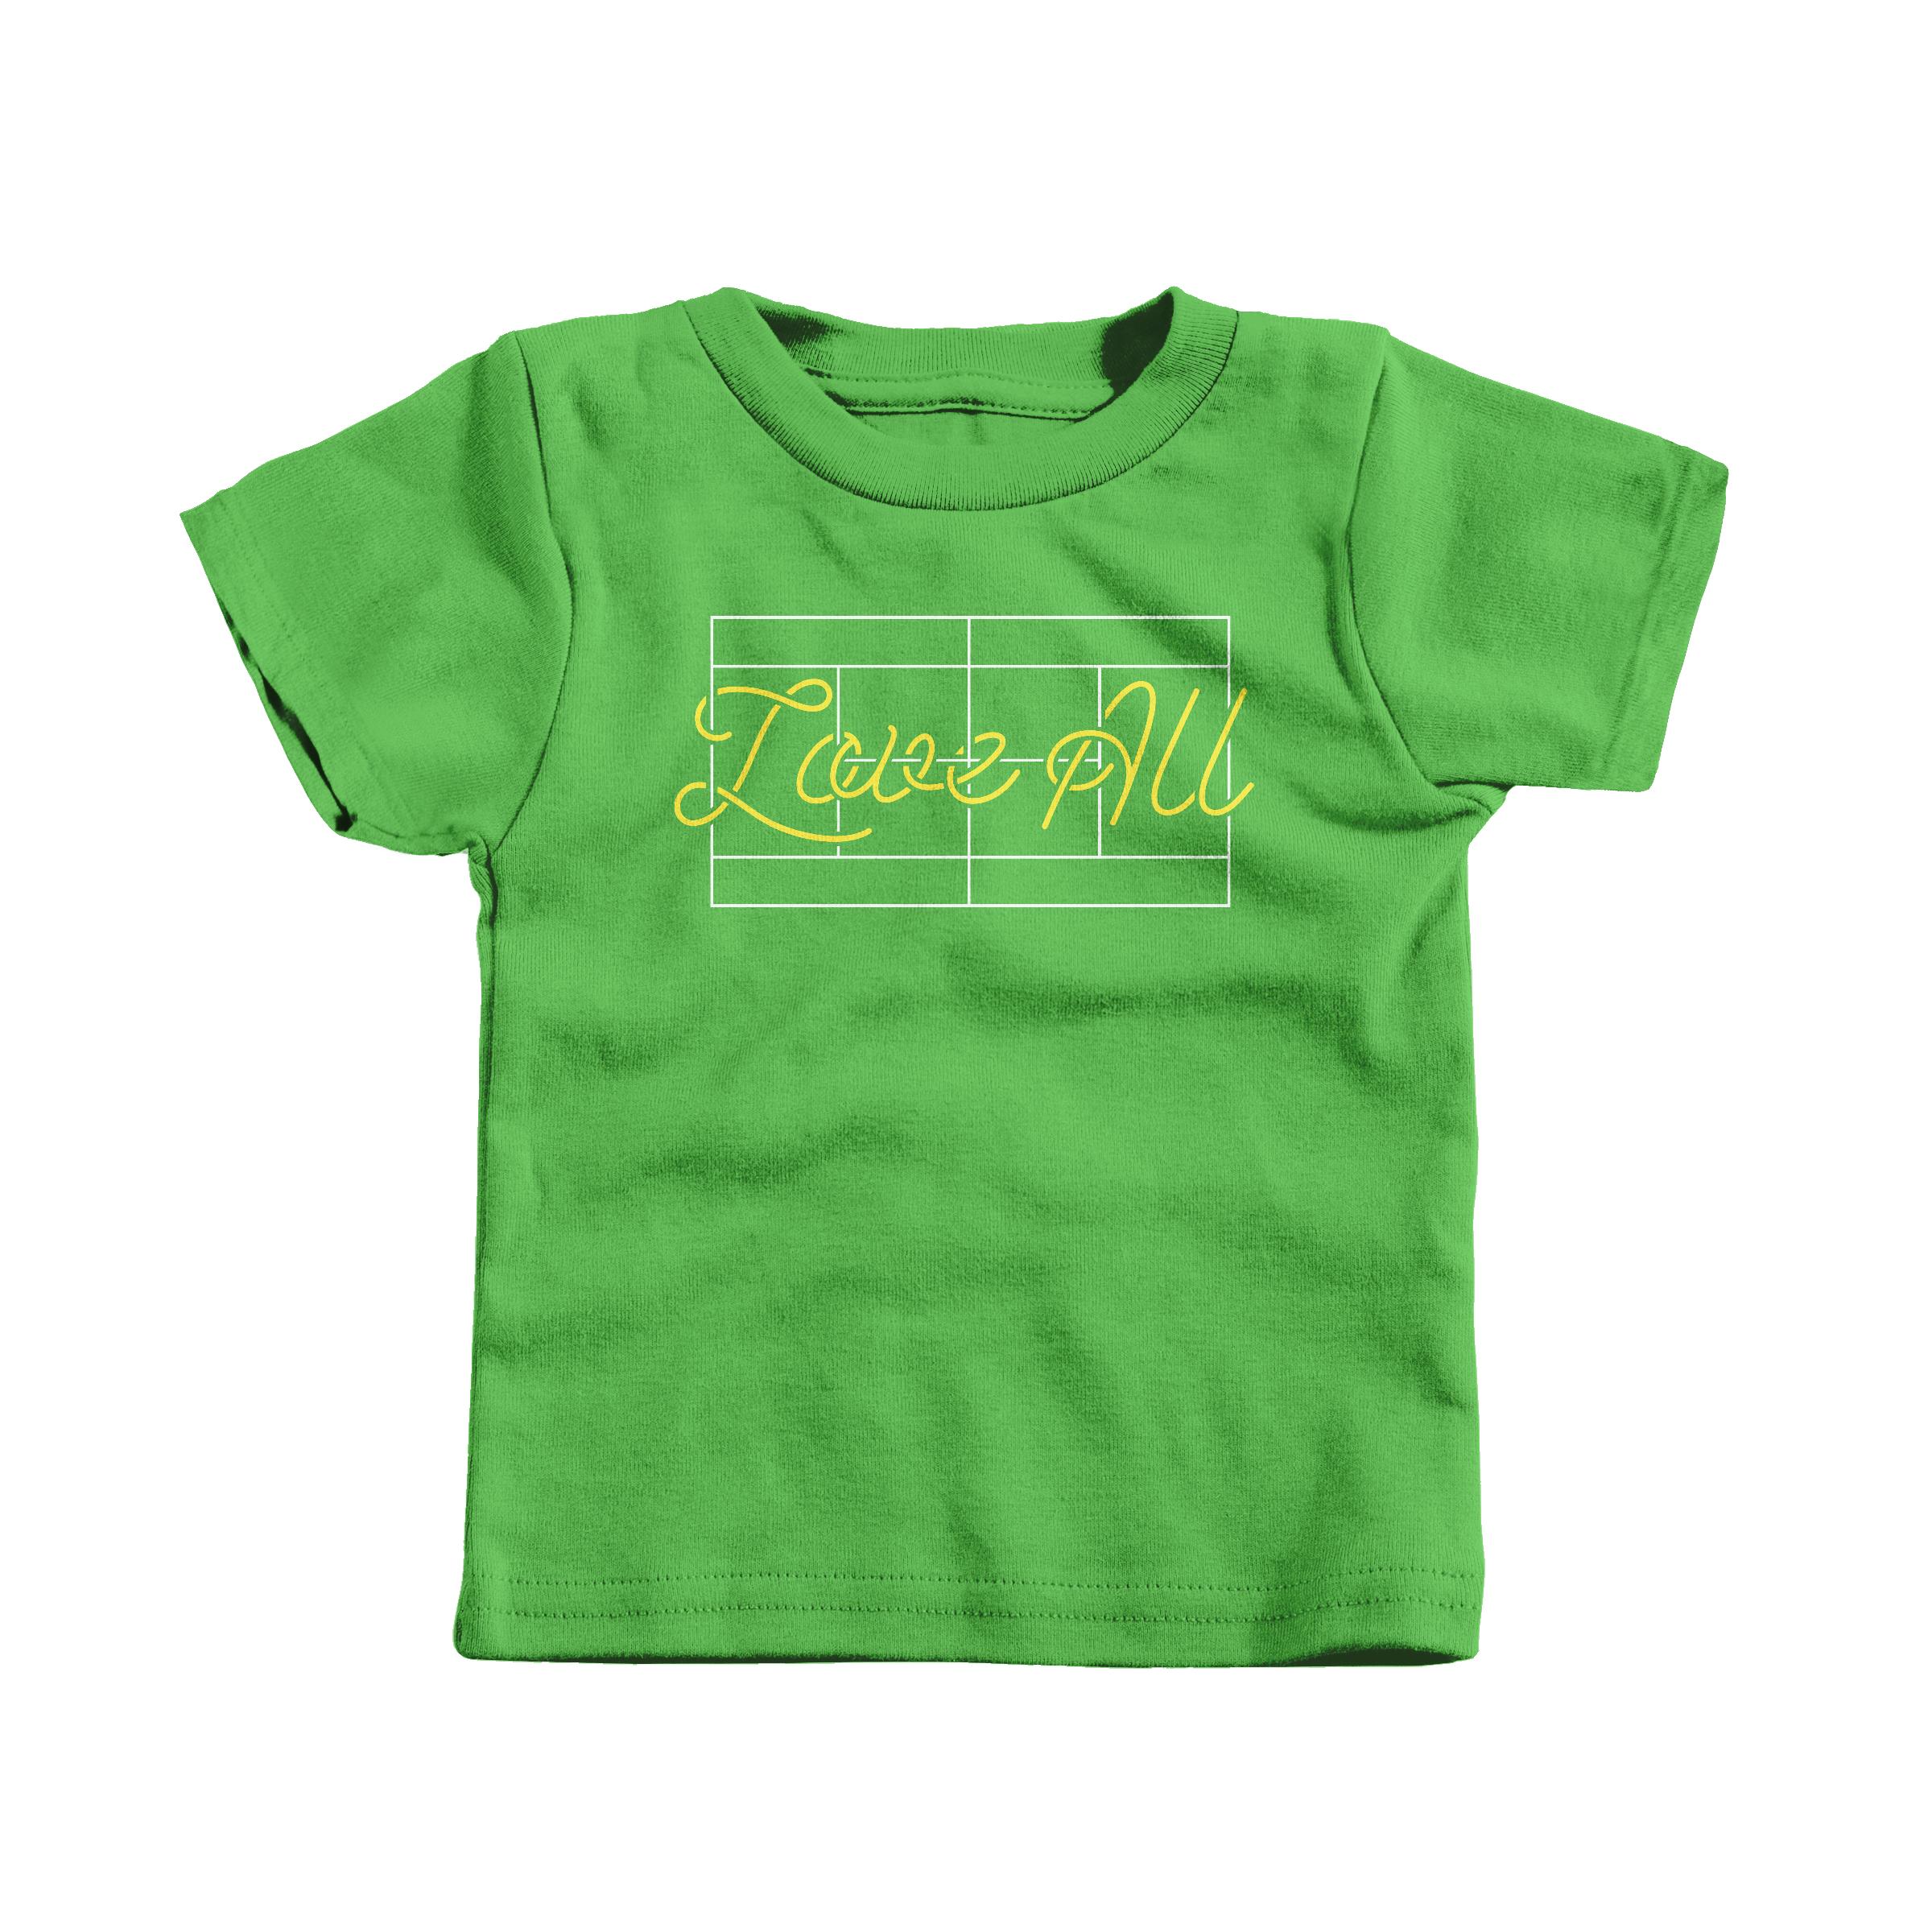 Love All Apple (T-Shirt)